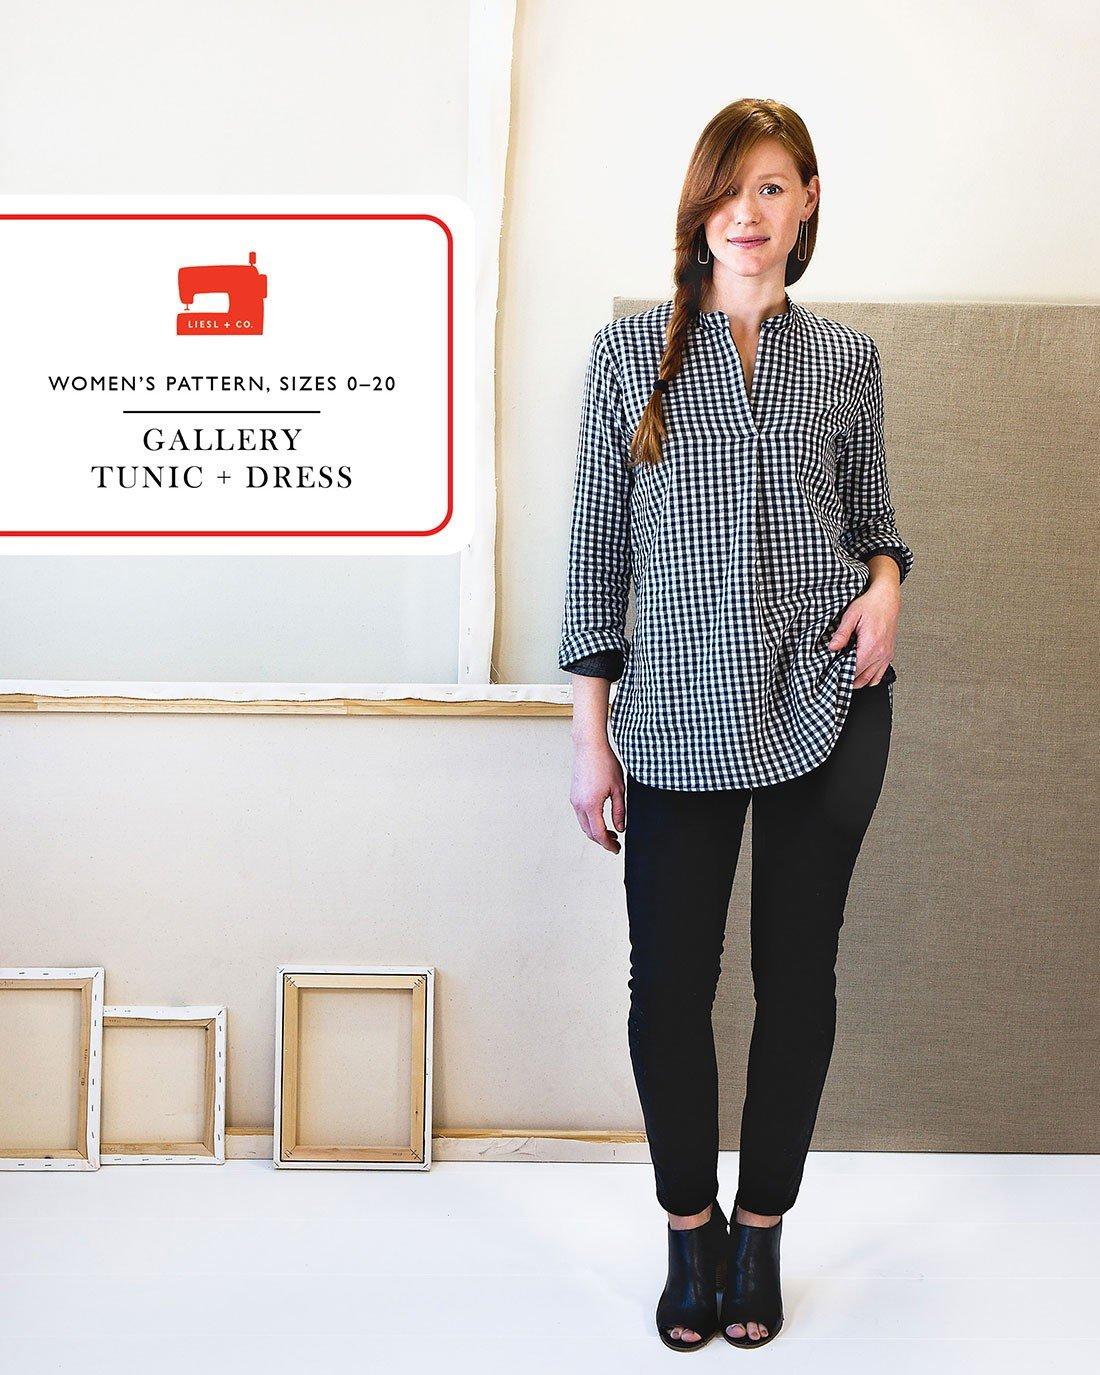 Gallery Tunic & Dress